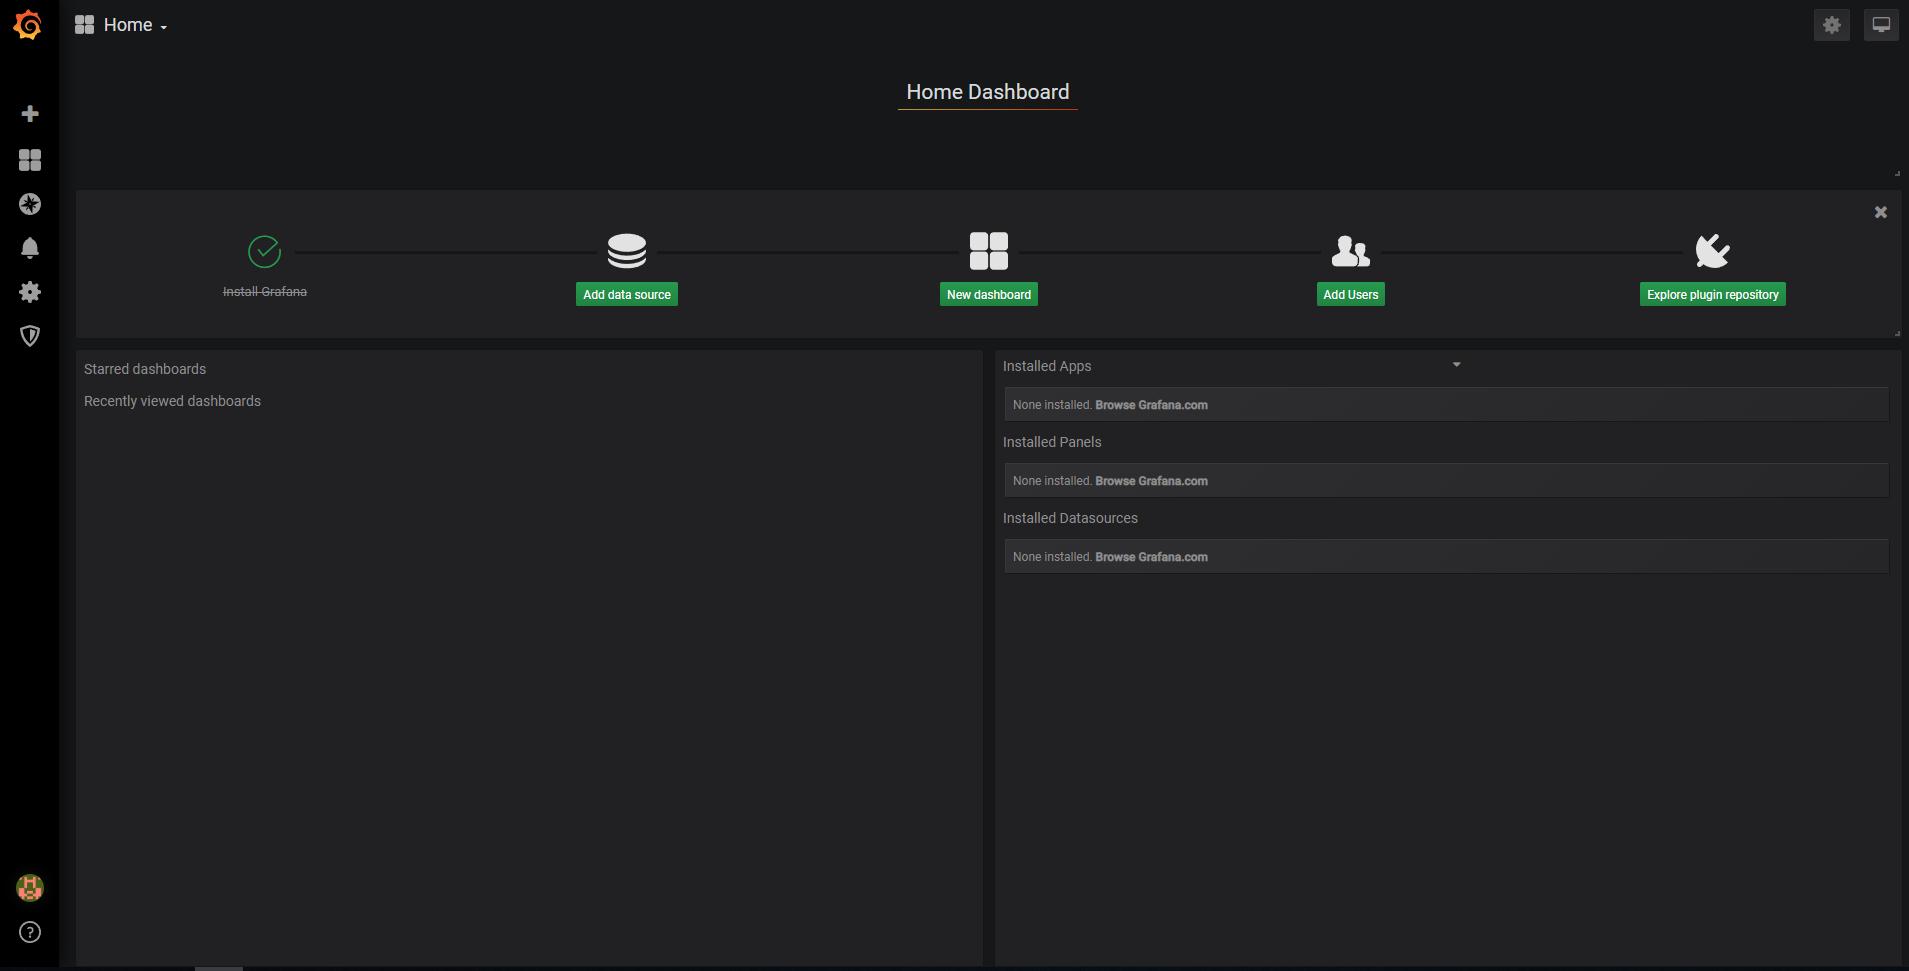 Grafana welcome default screen